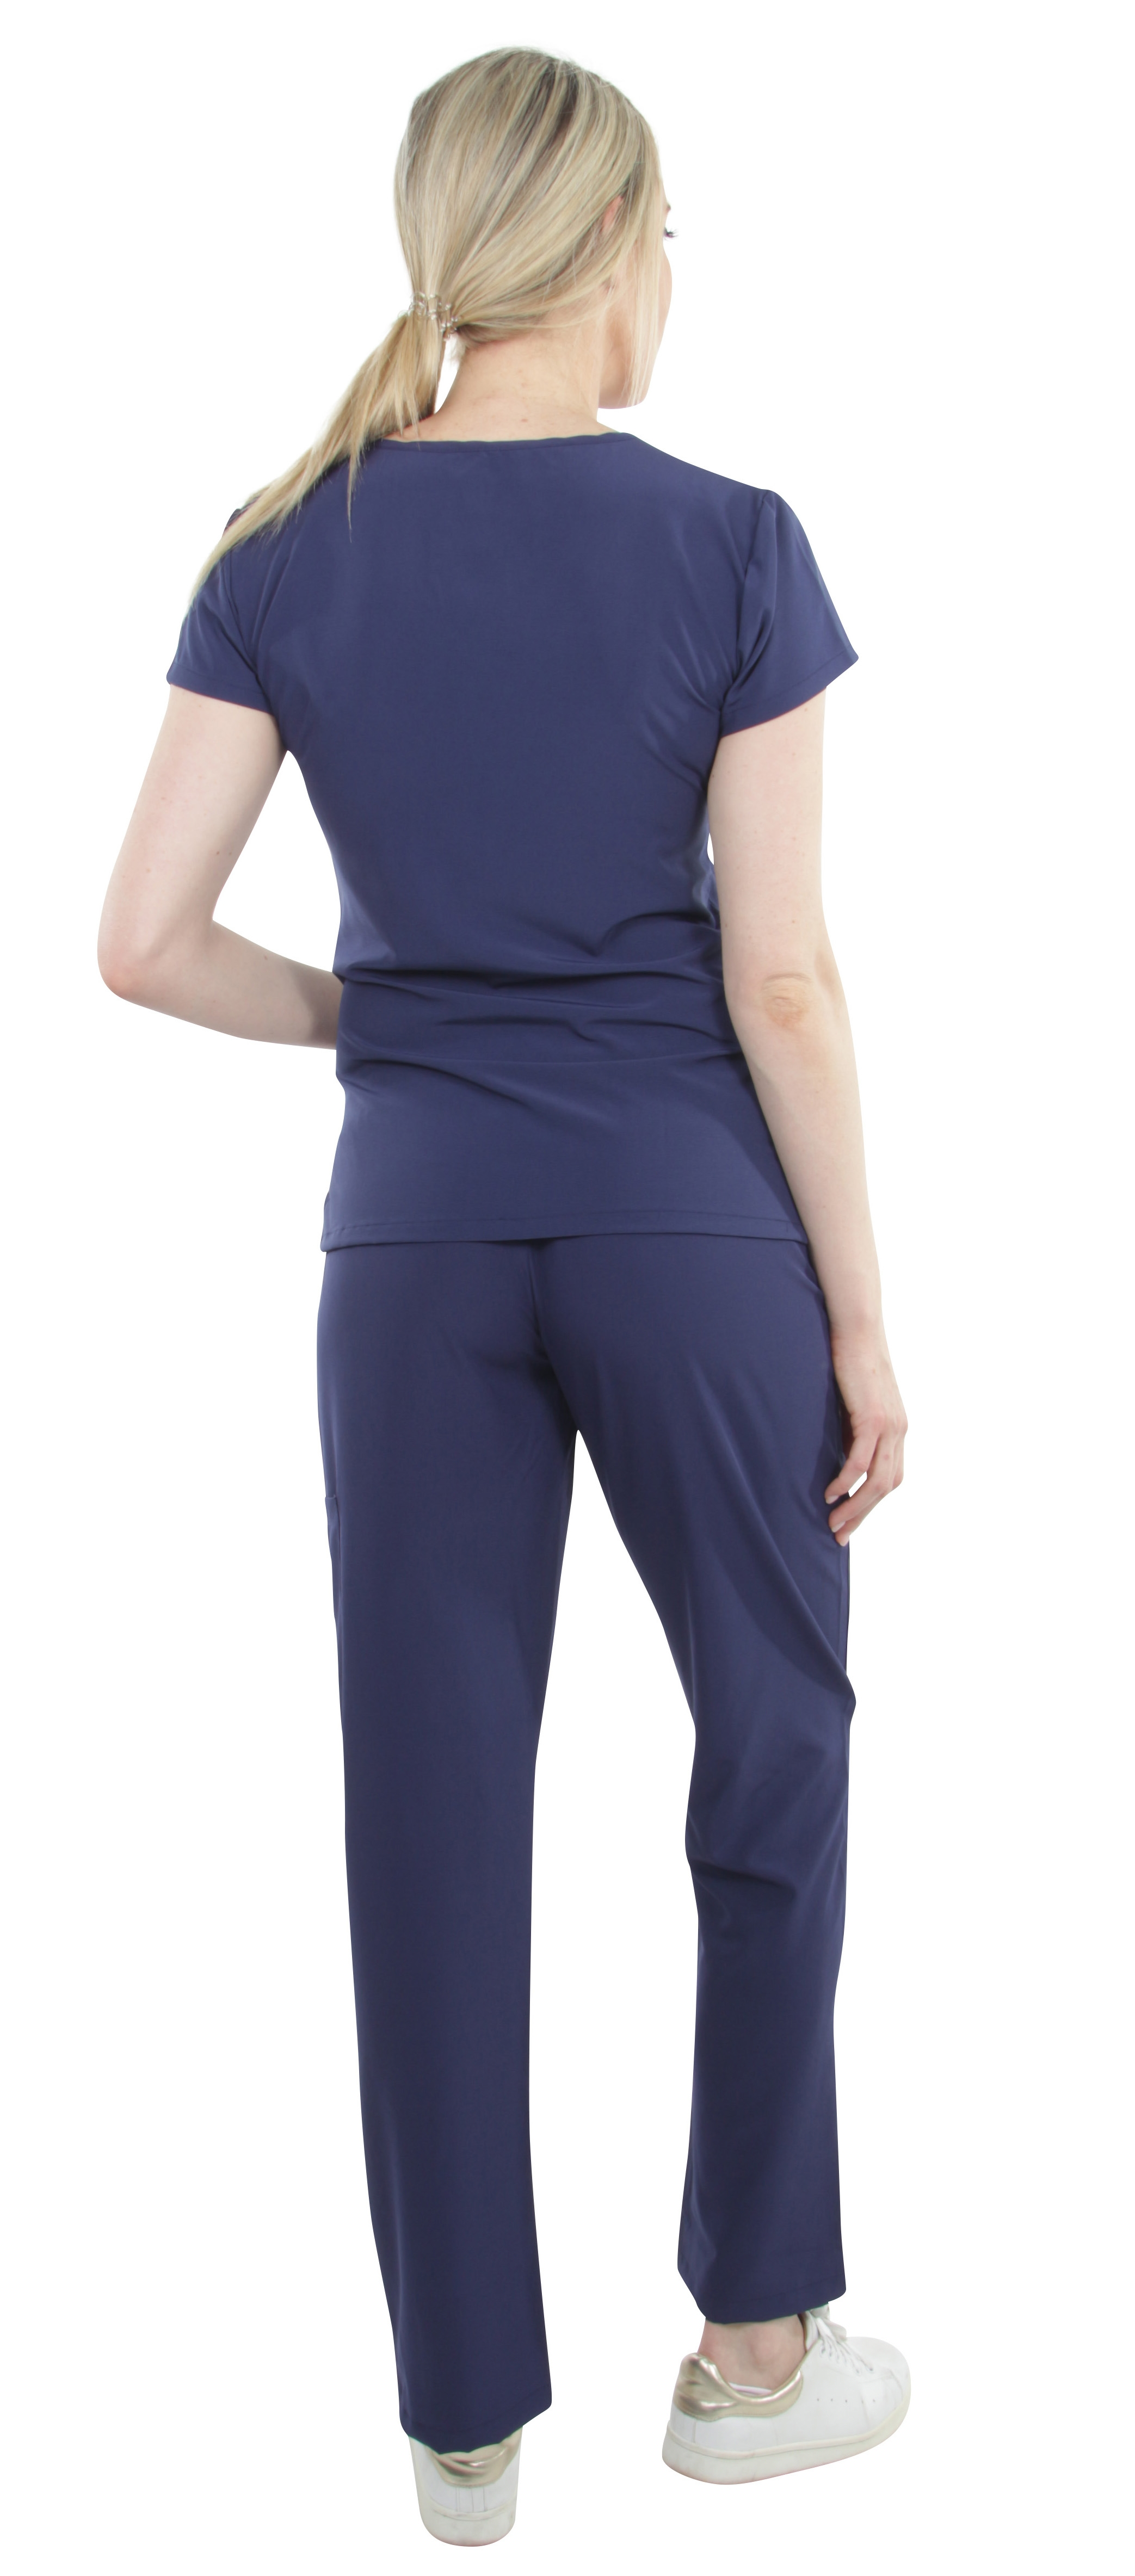 Unisex-Performance-Stretch-Medical-Uniform-Five-Pockets-V-Neck-Scrubs-Sets miniature 37